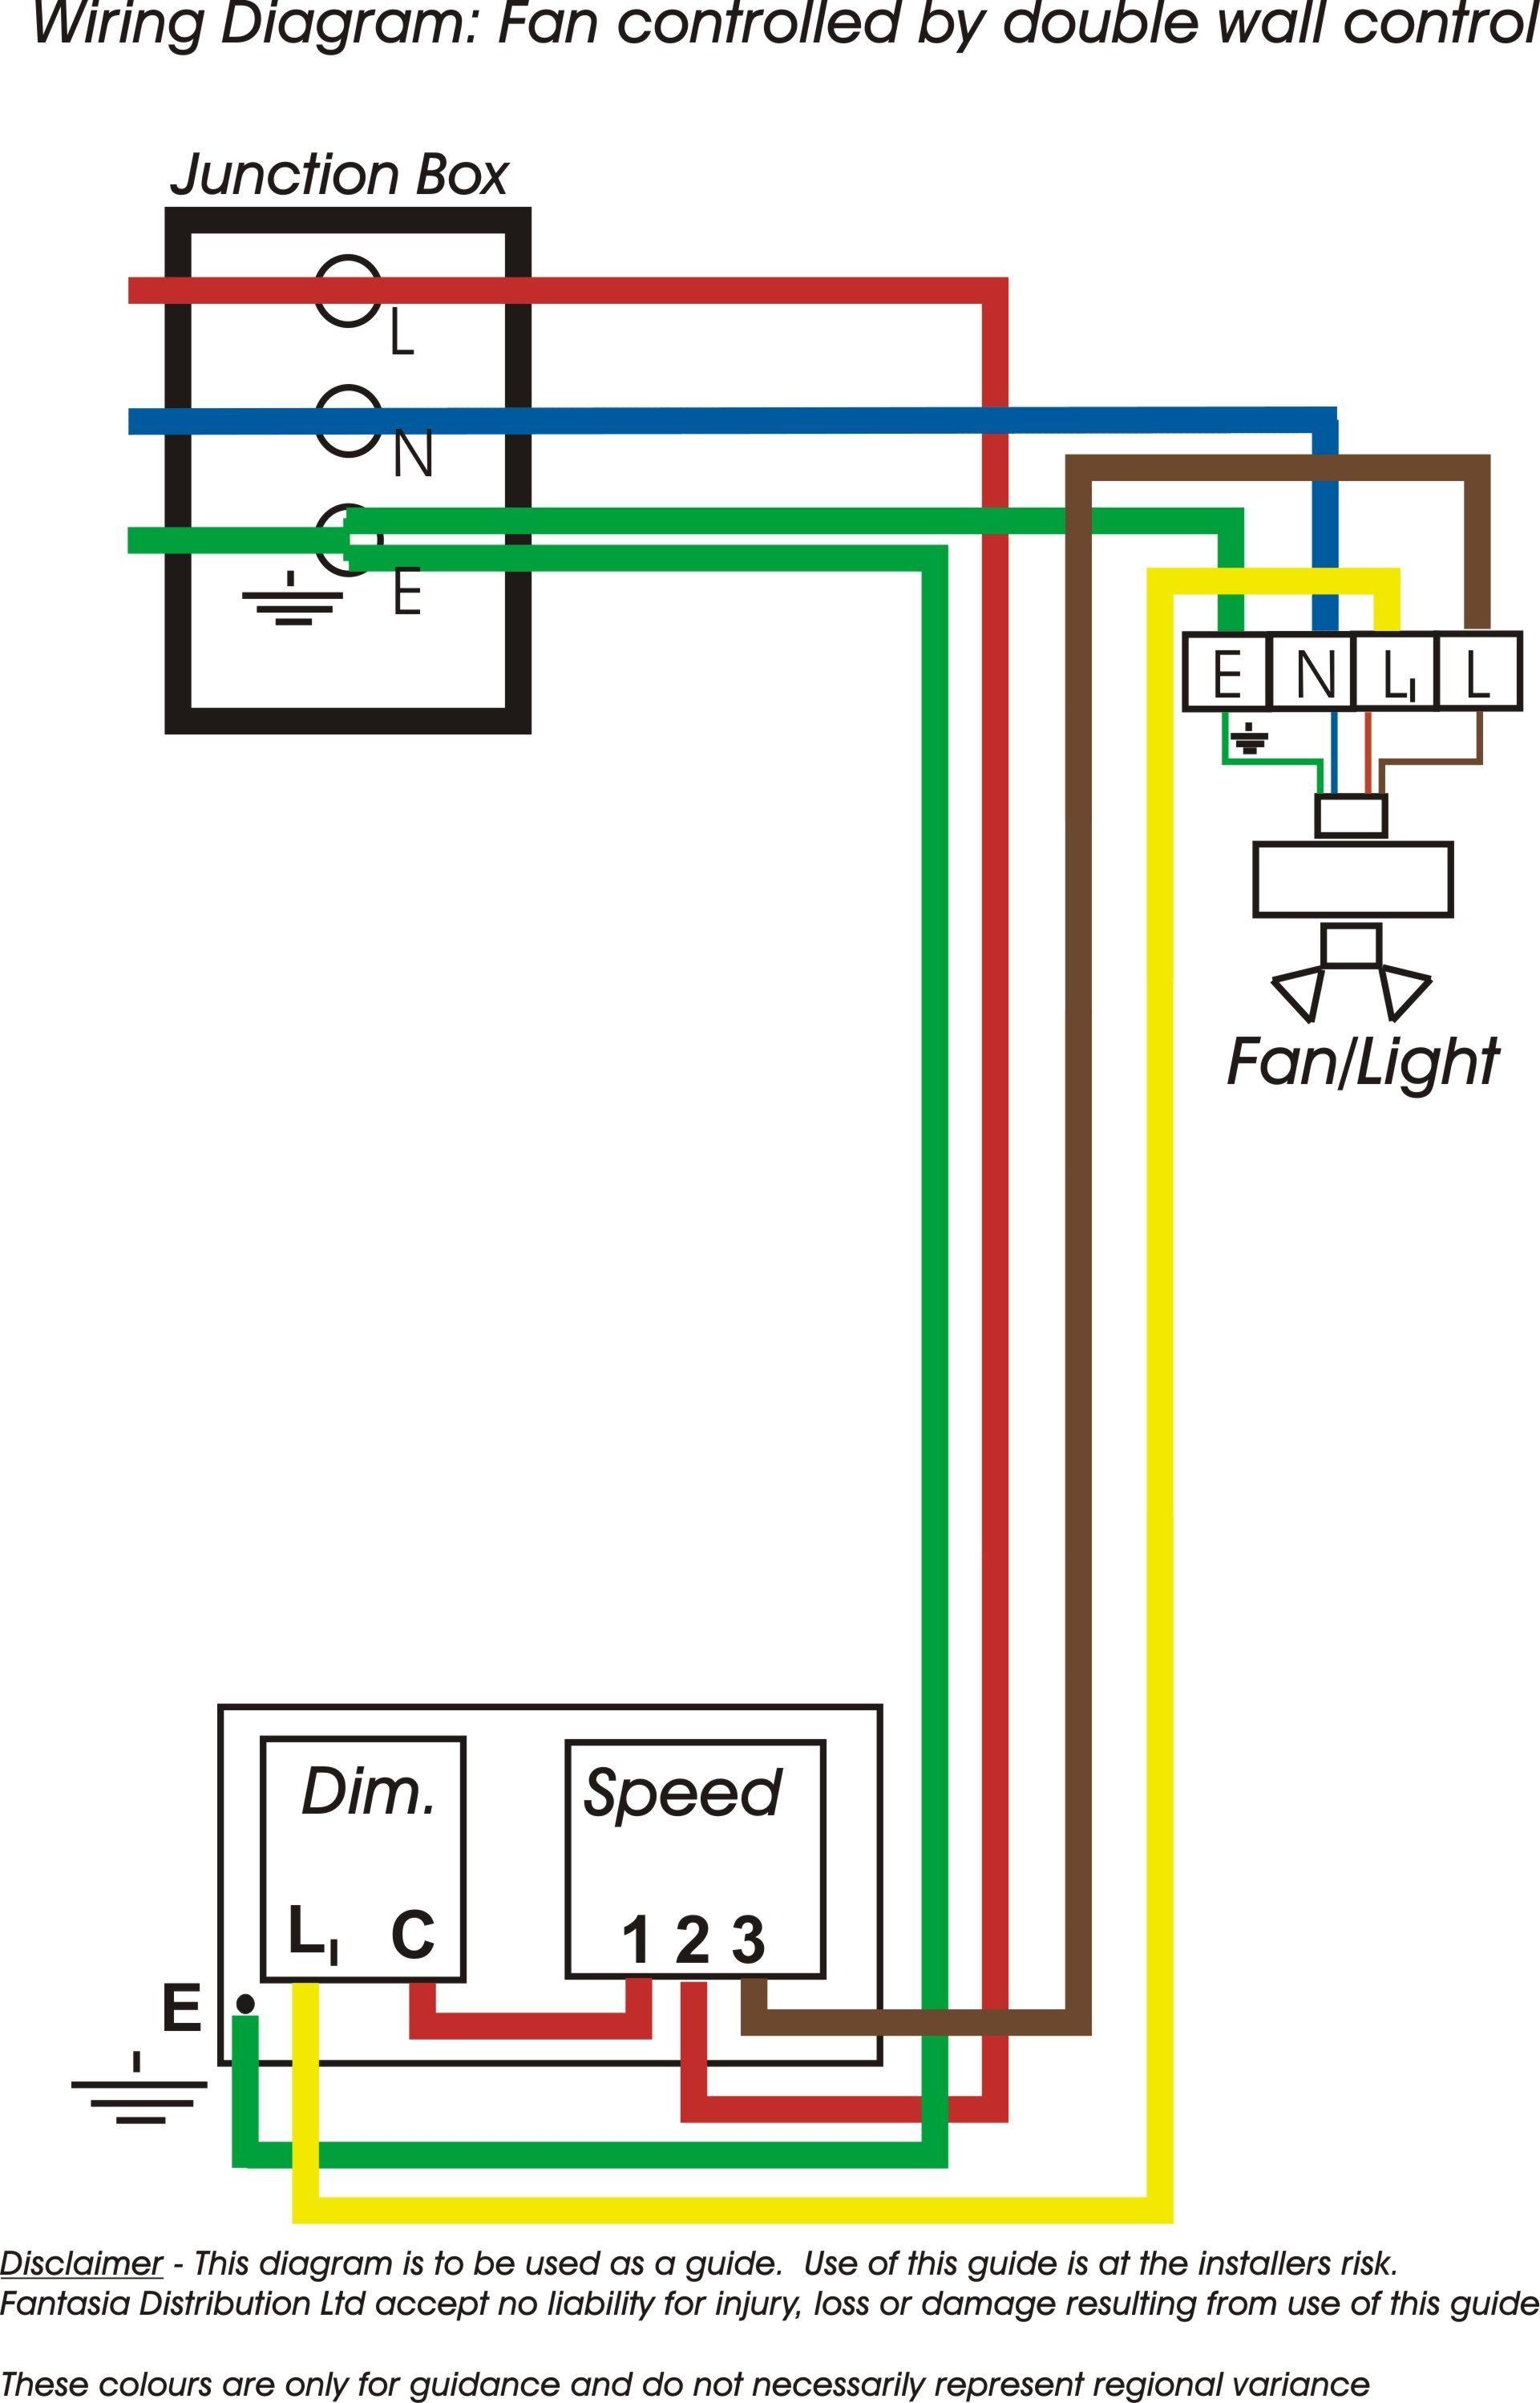 Hunter Universal Fan Remote Wiring | House | Ceiling Fan, Ceiling - Ceiling Fan Wall Switch Wiring Diagram